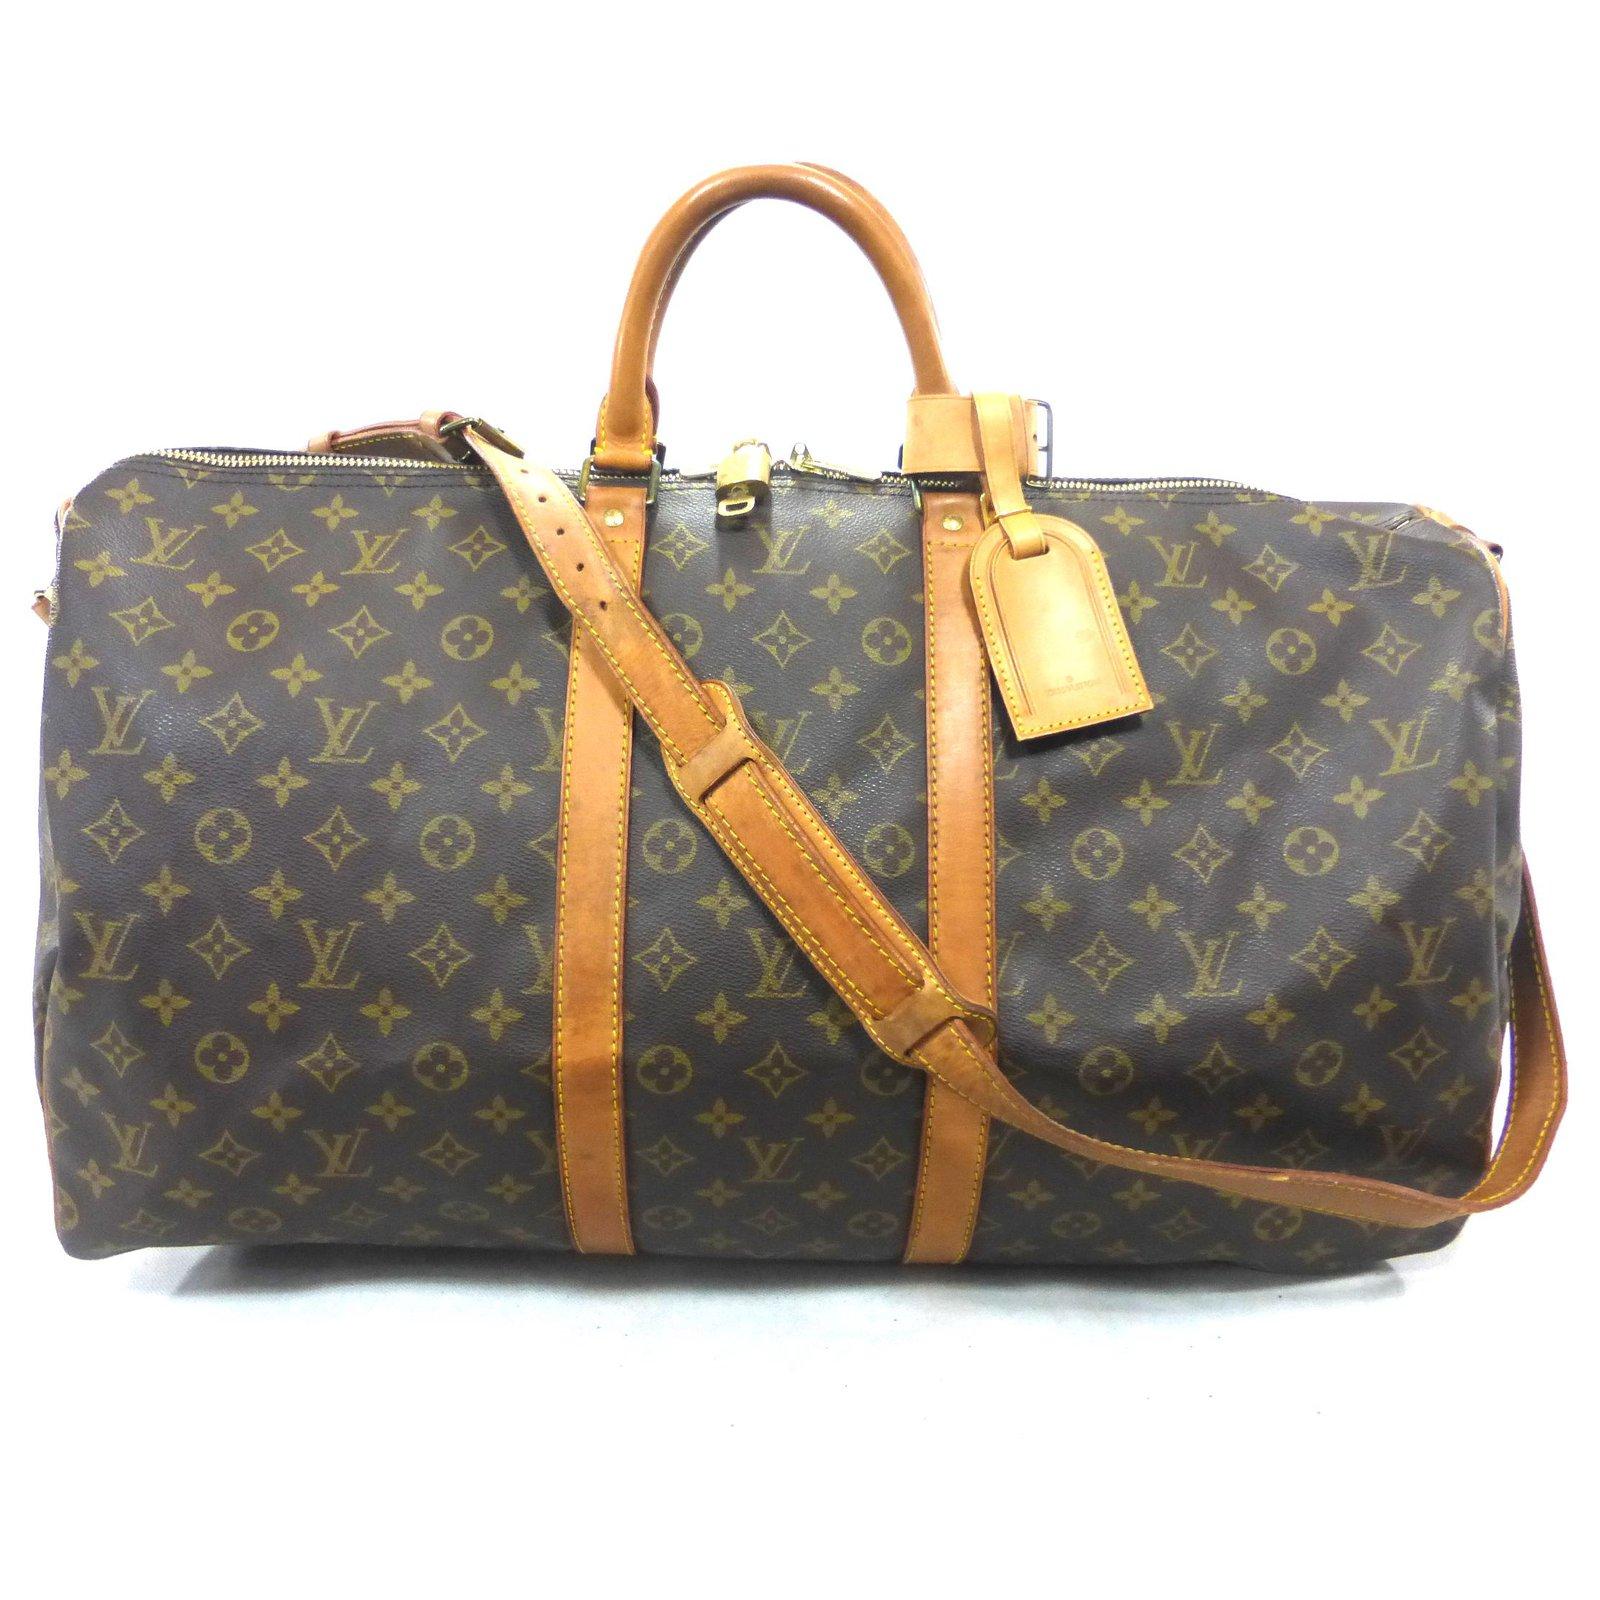 6faf8ccd4b502 Louis Vuitton keepall 55 monogram shoulder strap Travel bag Leather Brown  ref.129266